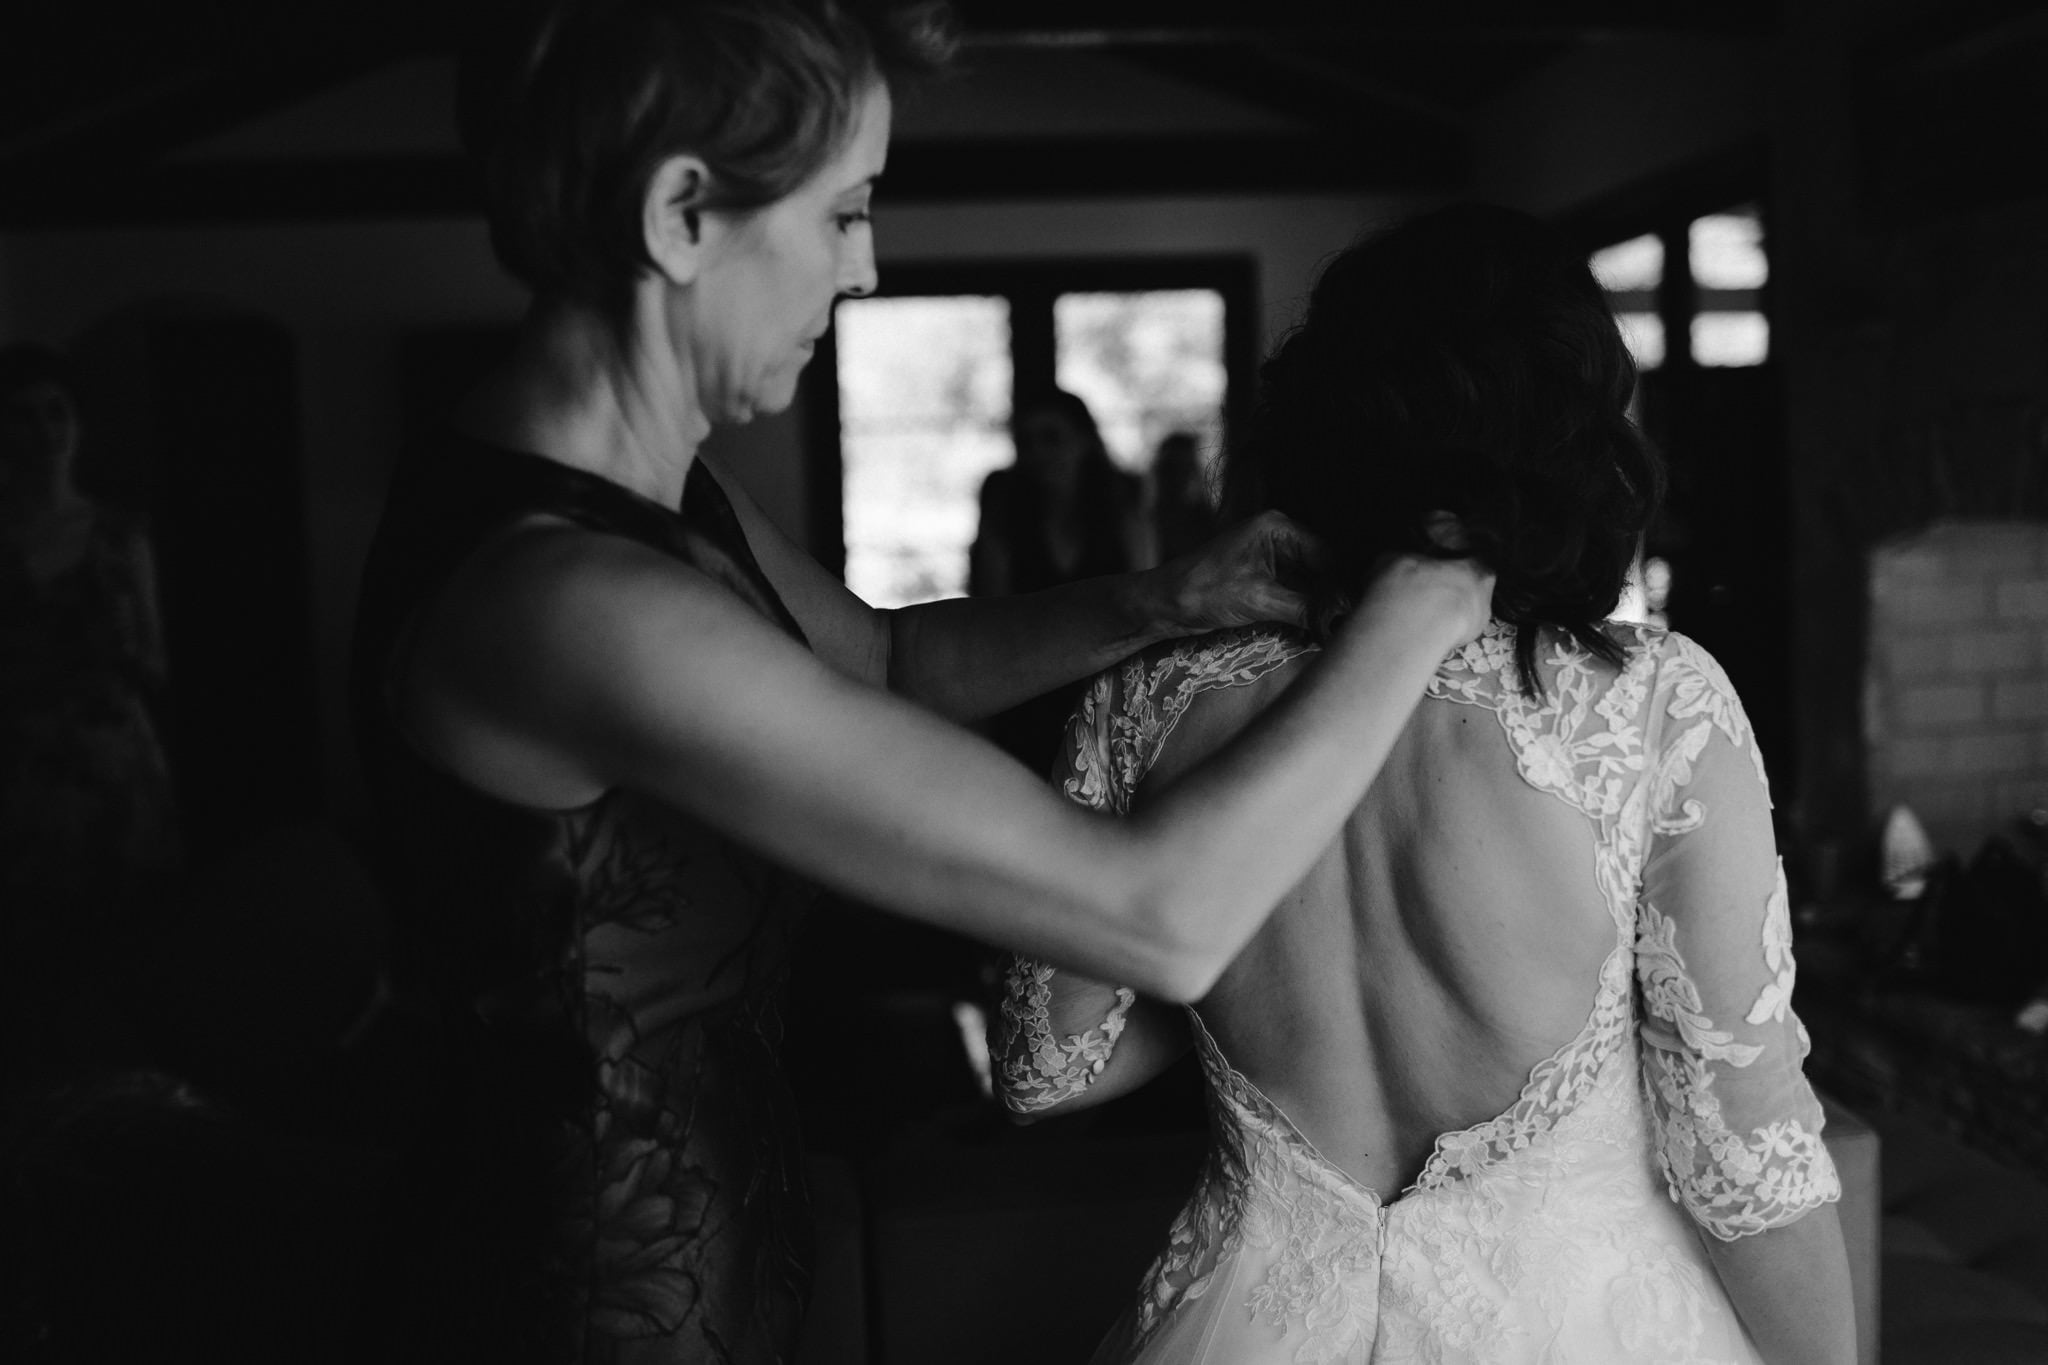 simi valley wedding photography 041